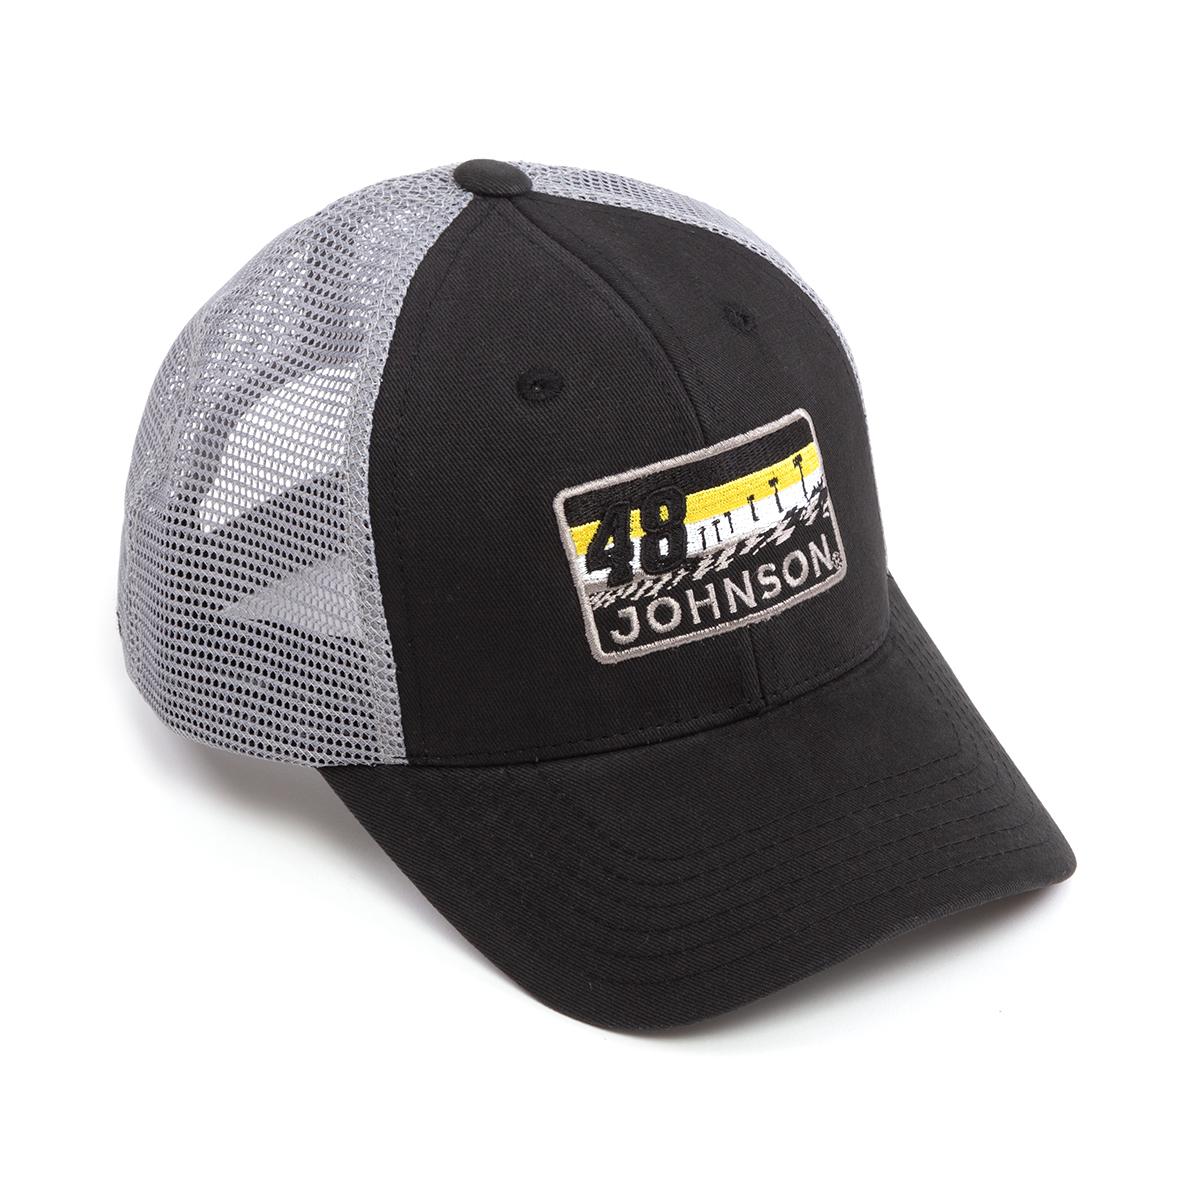 Jimmie Johnson 2018 NASCAR Grandstand Hat